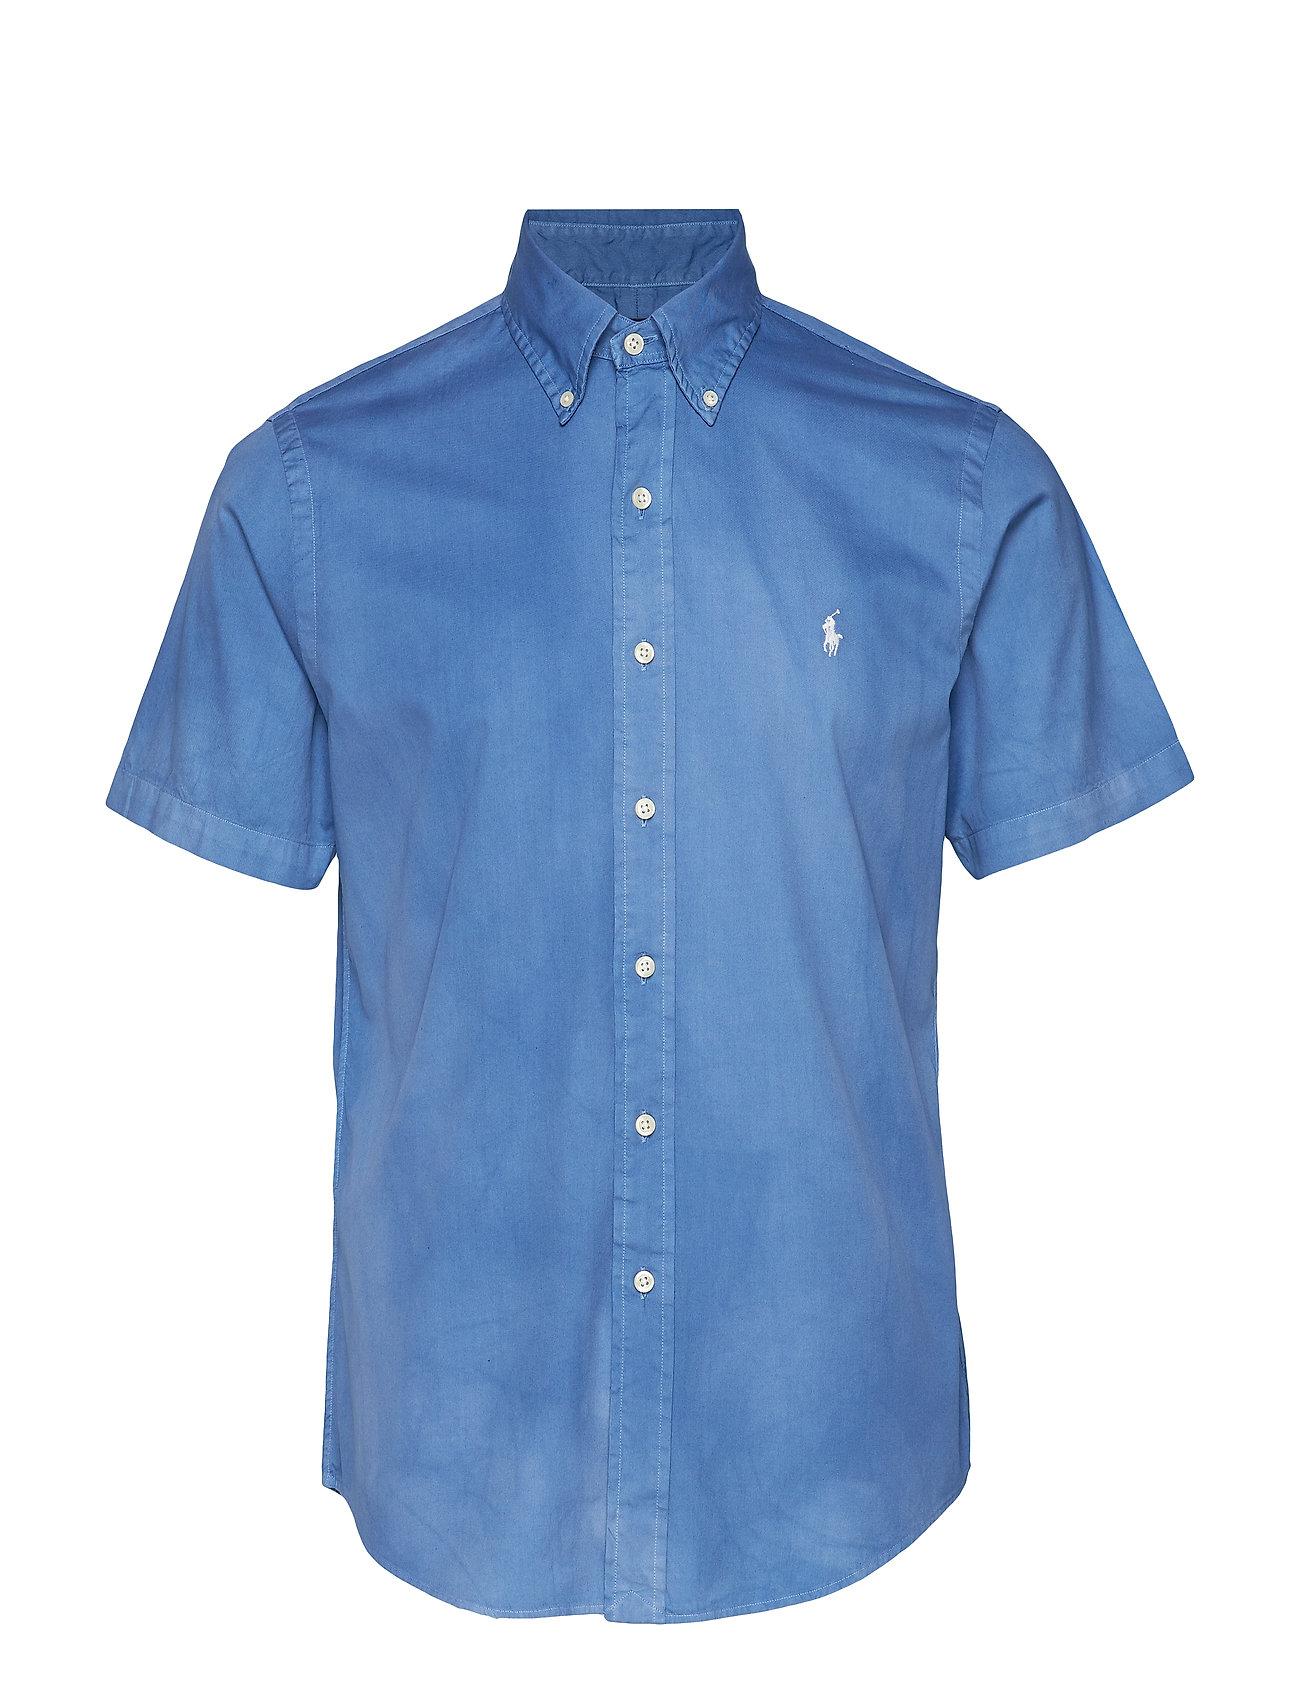 Polo Ralph Lauren Custom Fit Twill Shirt